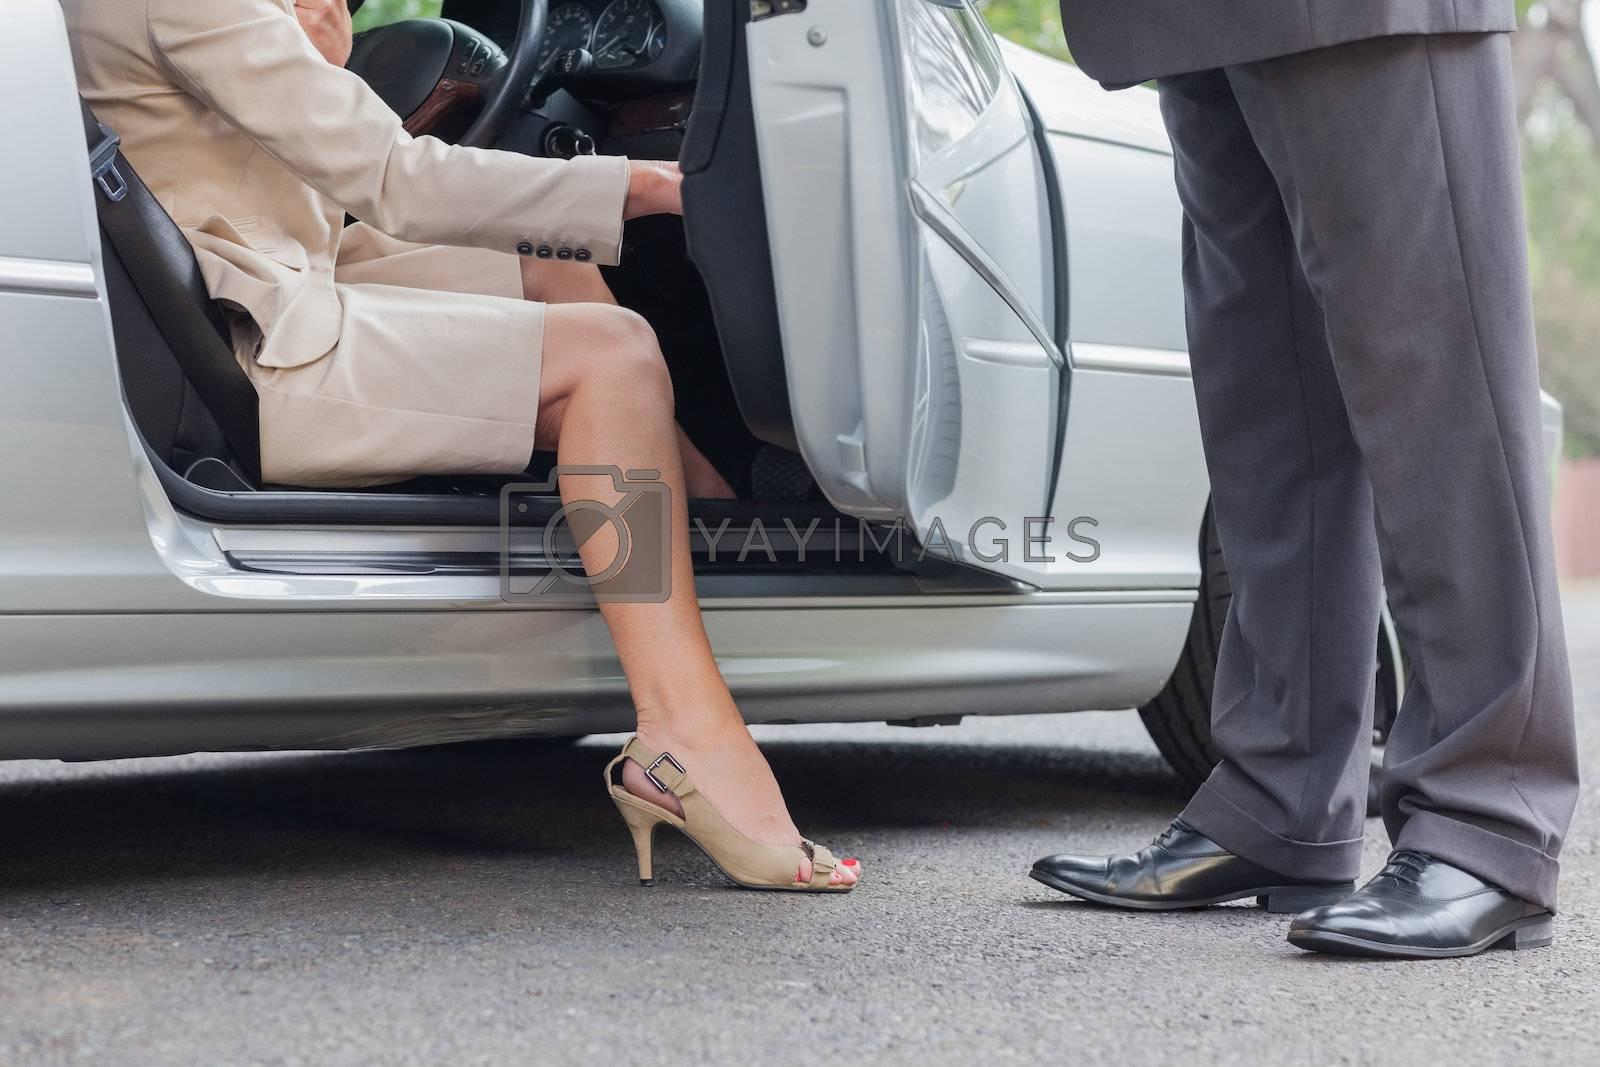 Businesswoman getting off classy cabriolet by Wavebreakmedia